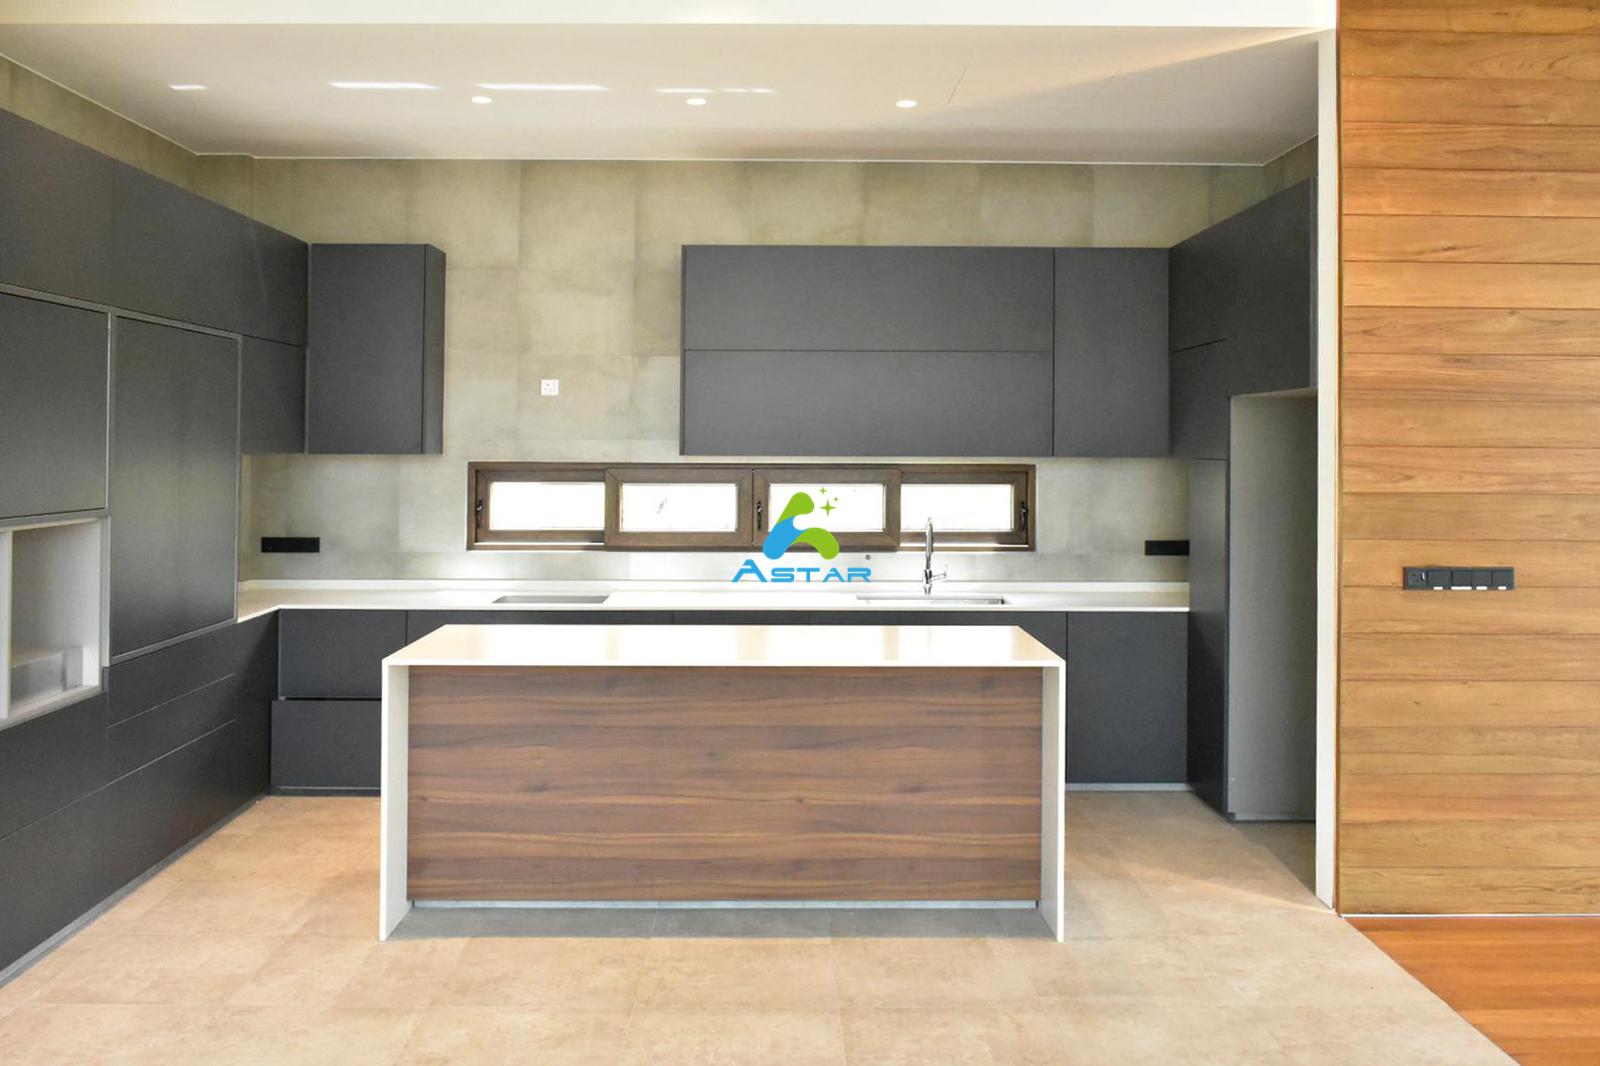 astar furnishing complete projects aluminium kitchen cabinet vanity cabinet wardrobe gardenia road 10